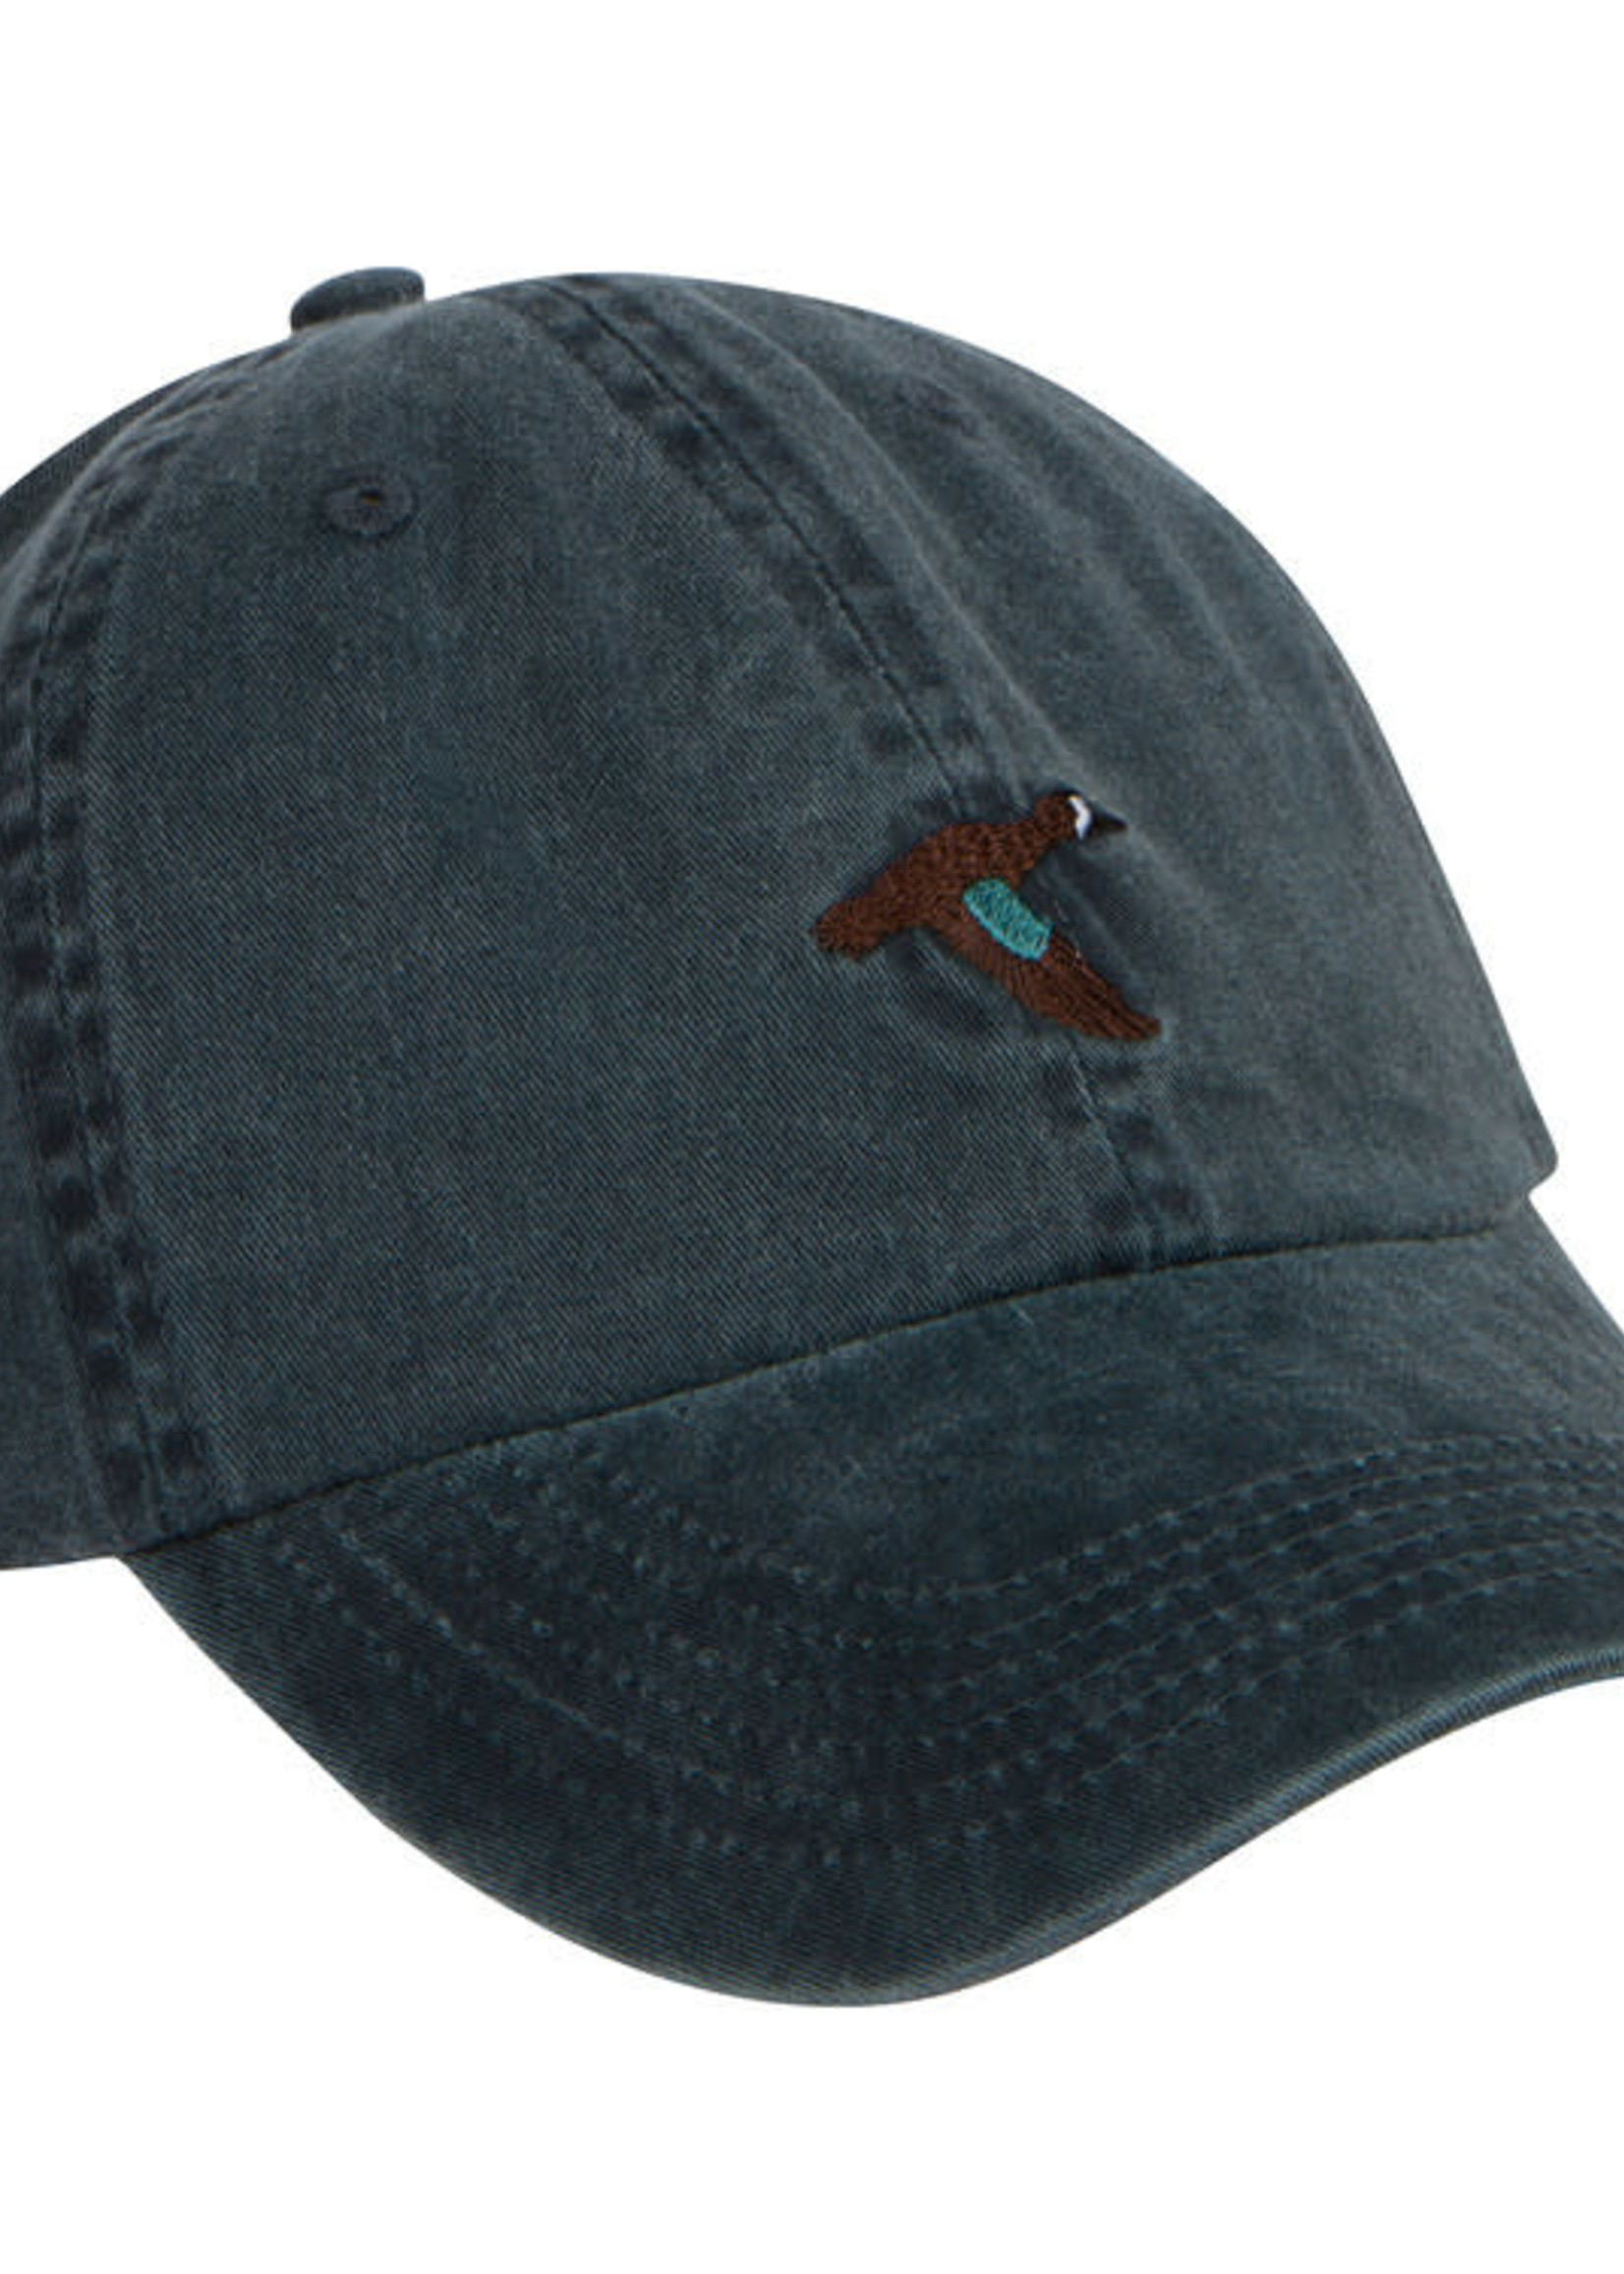 GenTeal Apparel Logo Hat